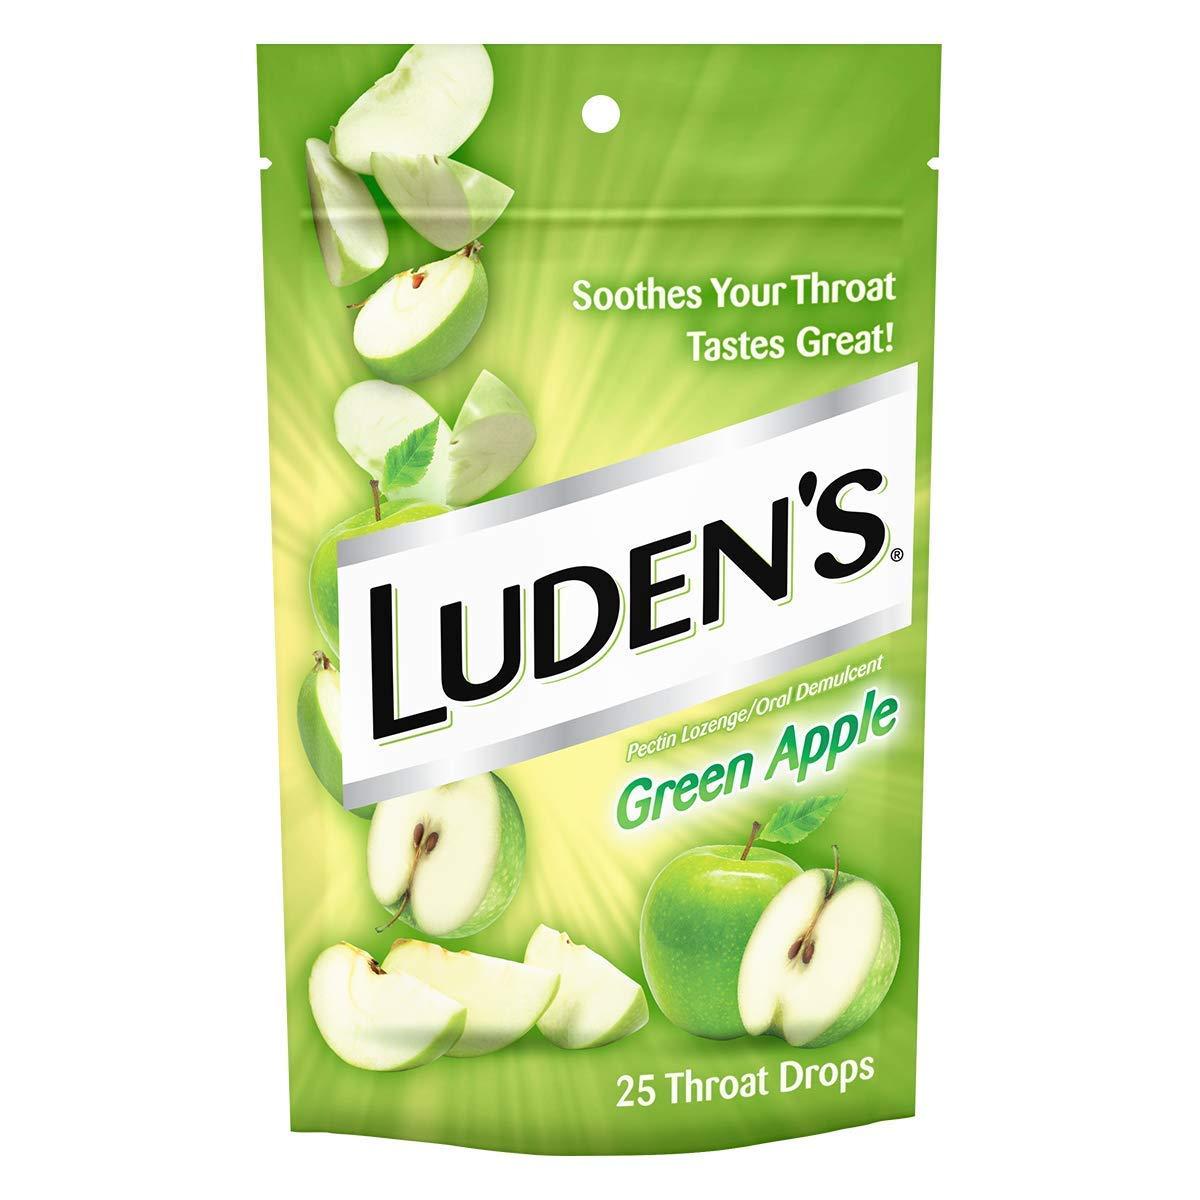 Luden's Green Apple Cough Throat Drops   Pectin Lozenge/Oral Demulcent   25-Drops per pack   4-Packs